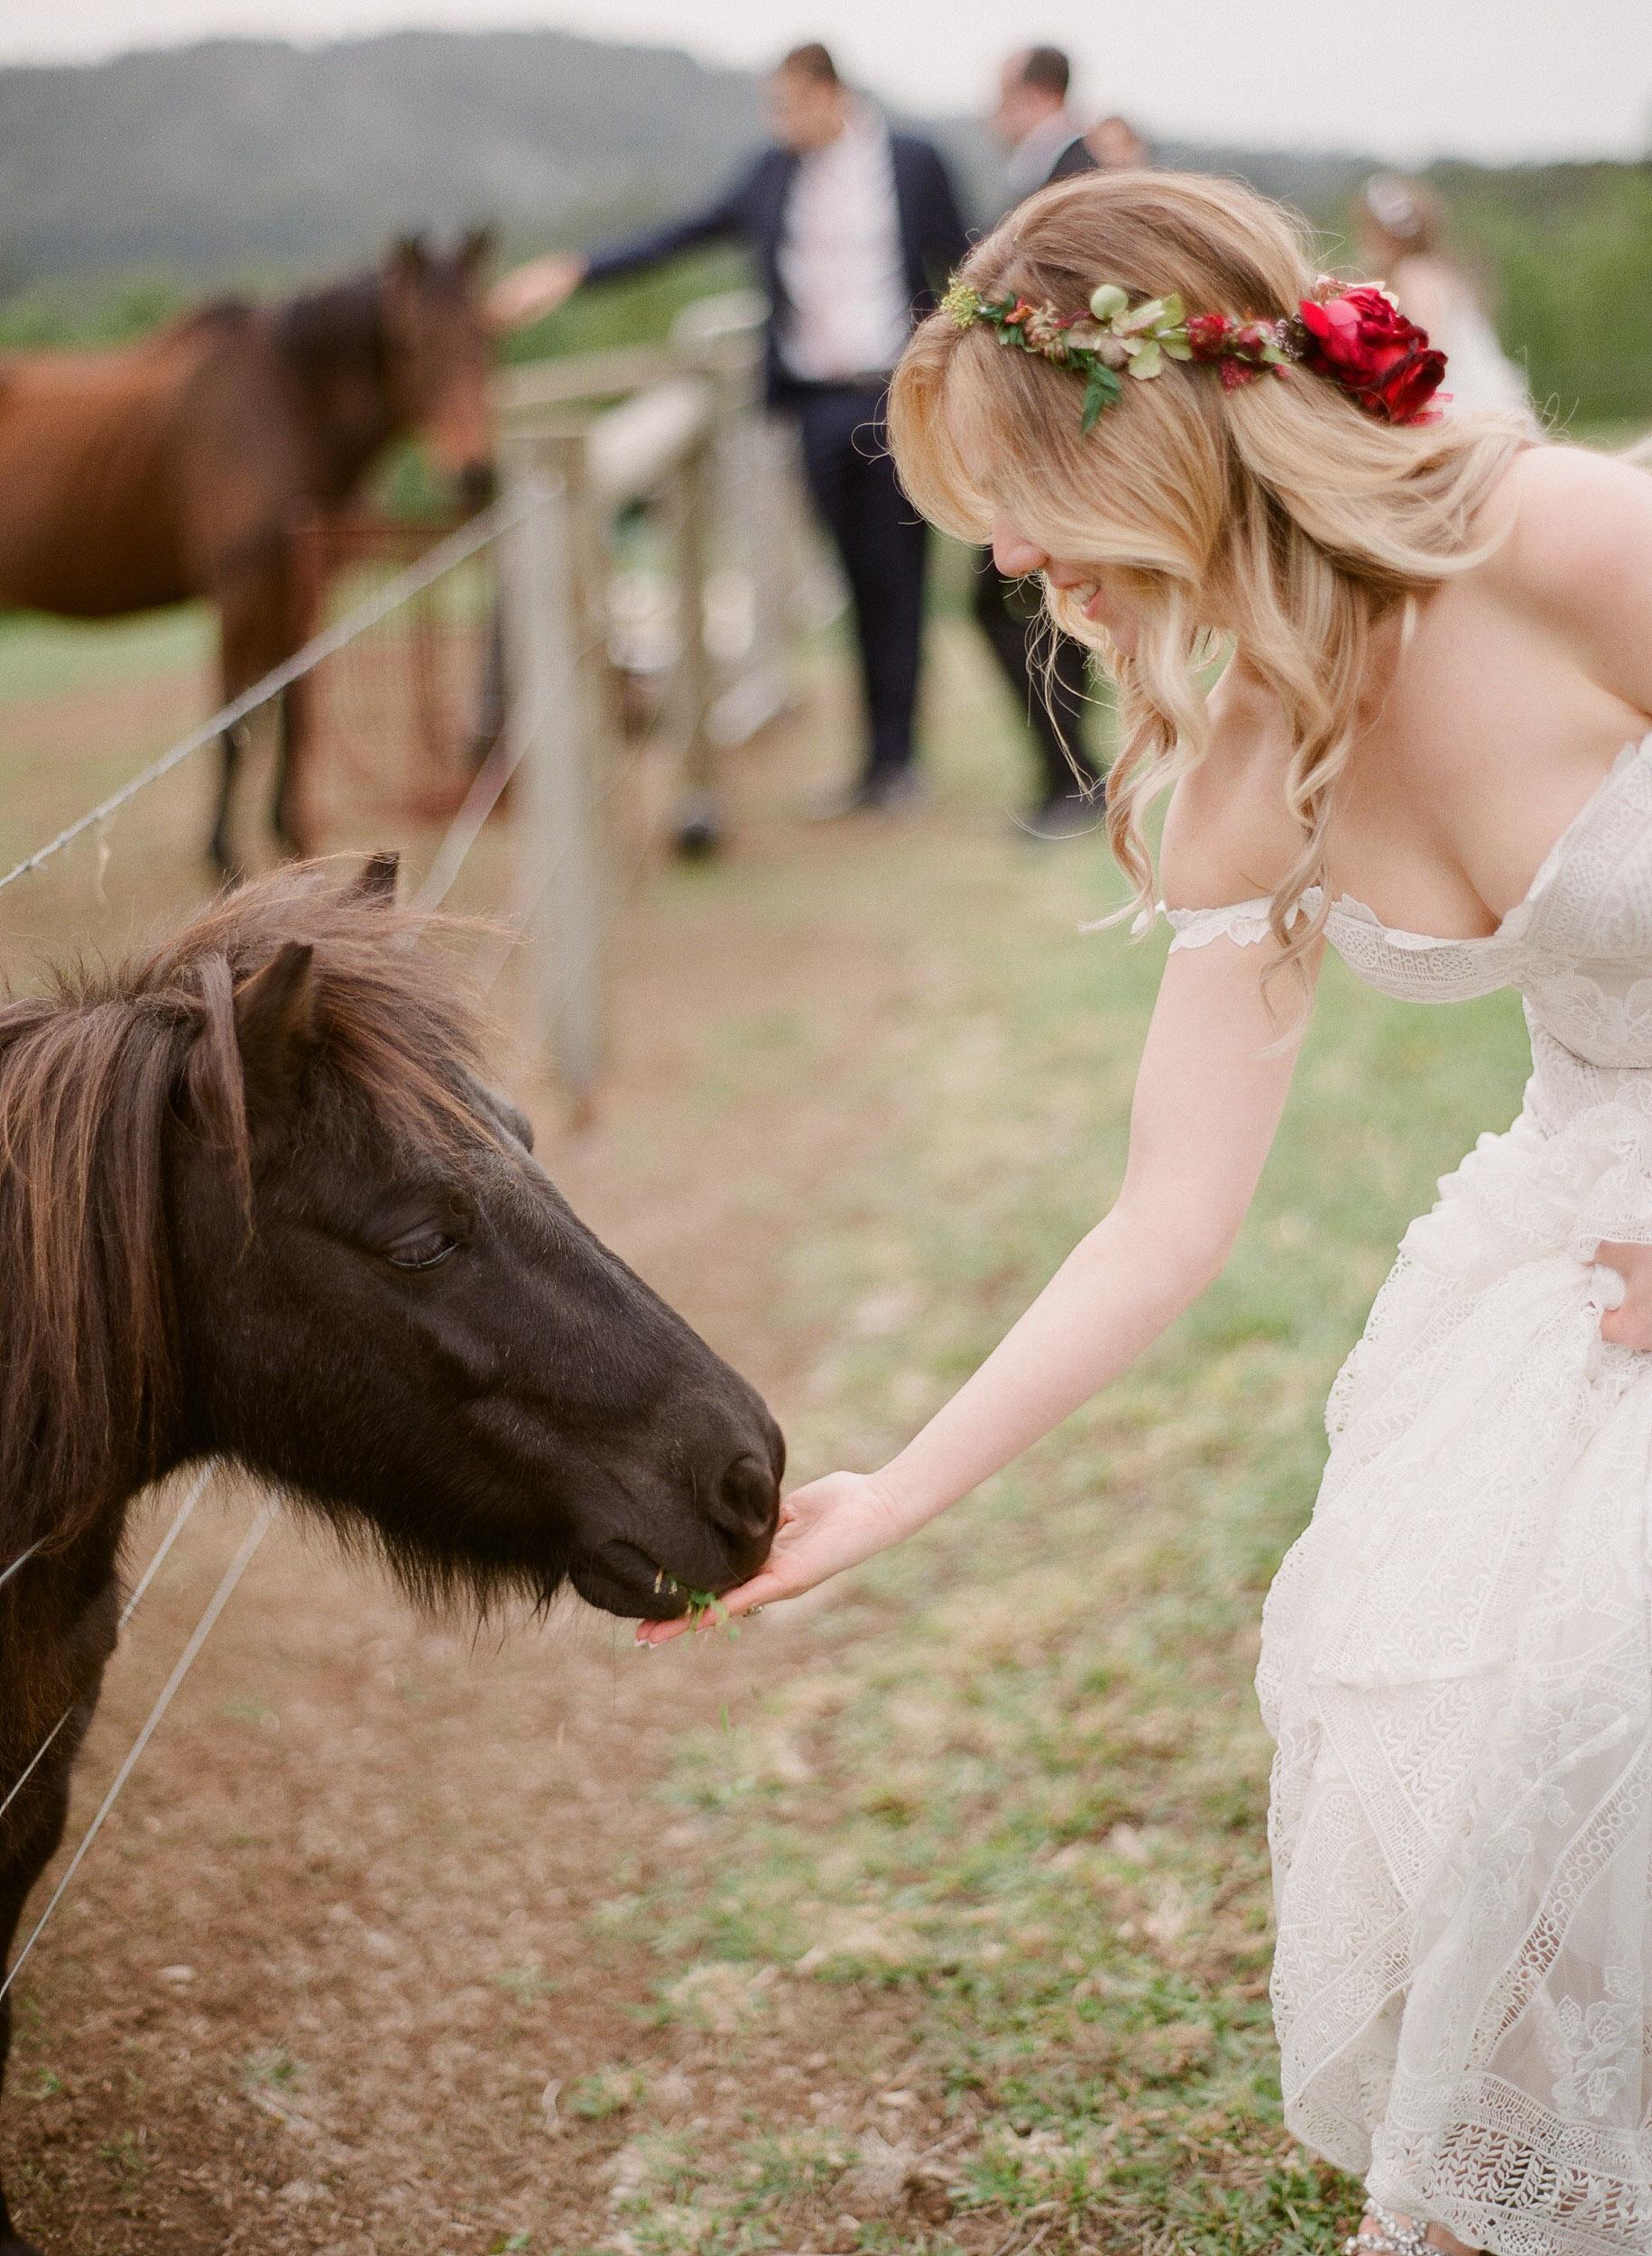 wedding (24 of 24) - 000098180005.jpg